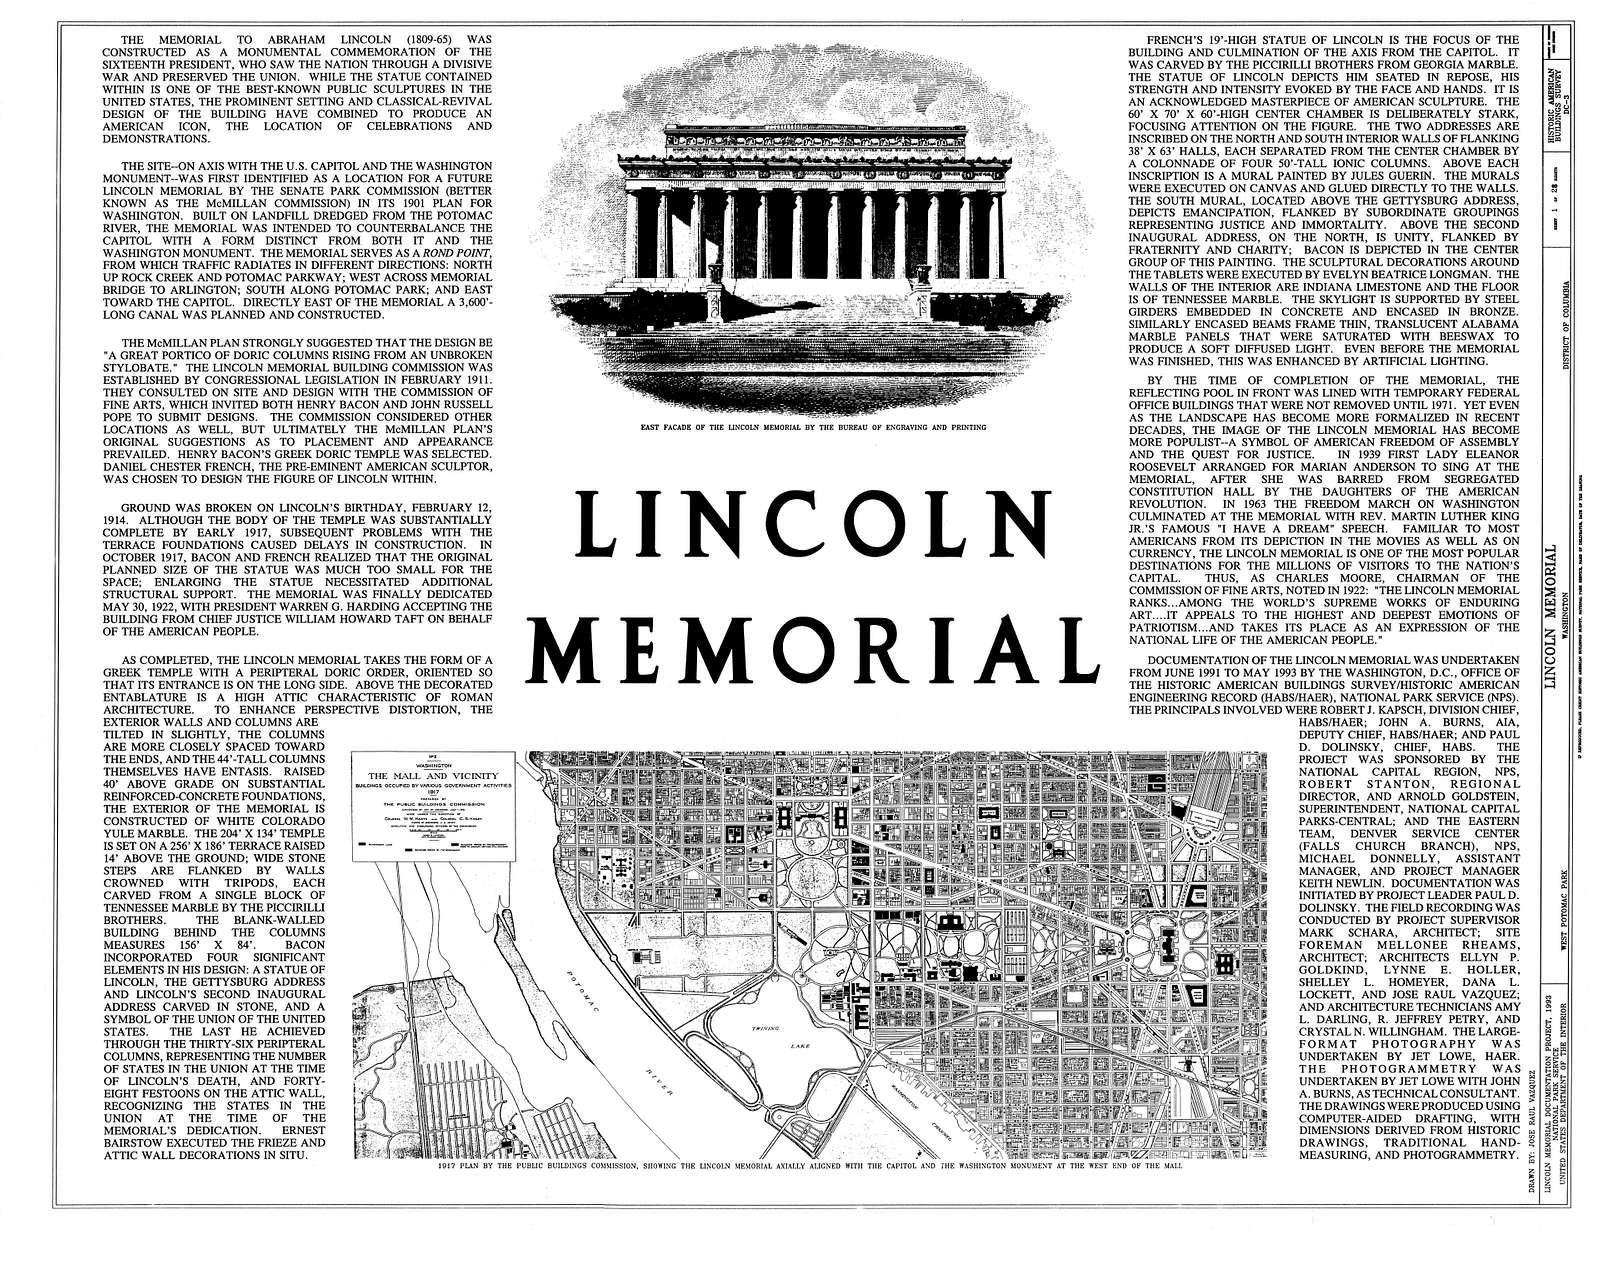 Lincoln Memorial, West Potomac Park, Washington, District of Columbia, DC